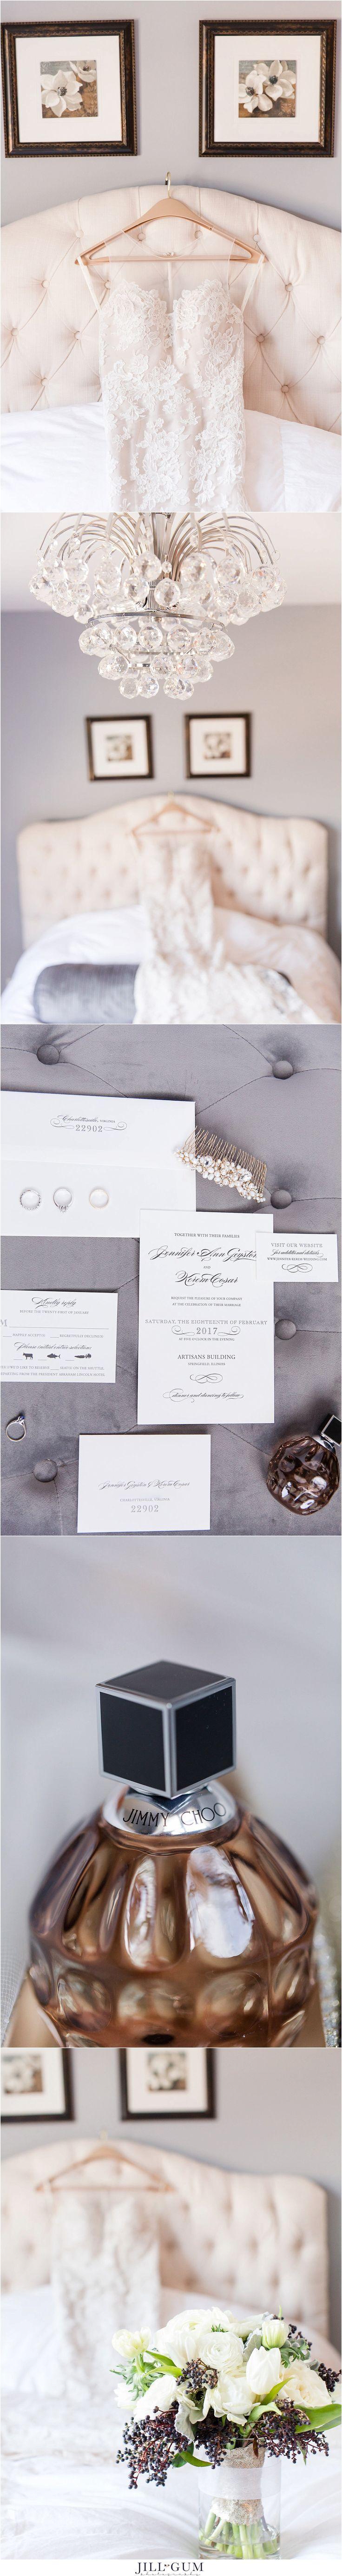 Jill Gum Photography | February Wedding | Springfield IL | Anna Maier Wedding Dress | Nordstrom Michigan Avenue Dress | Lace Wedding Gown | Wedding Bouquet | Elegant Wedding | Simple Wedding |